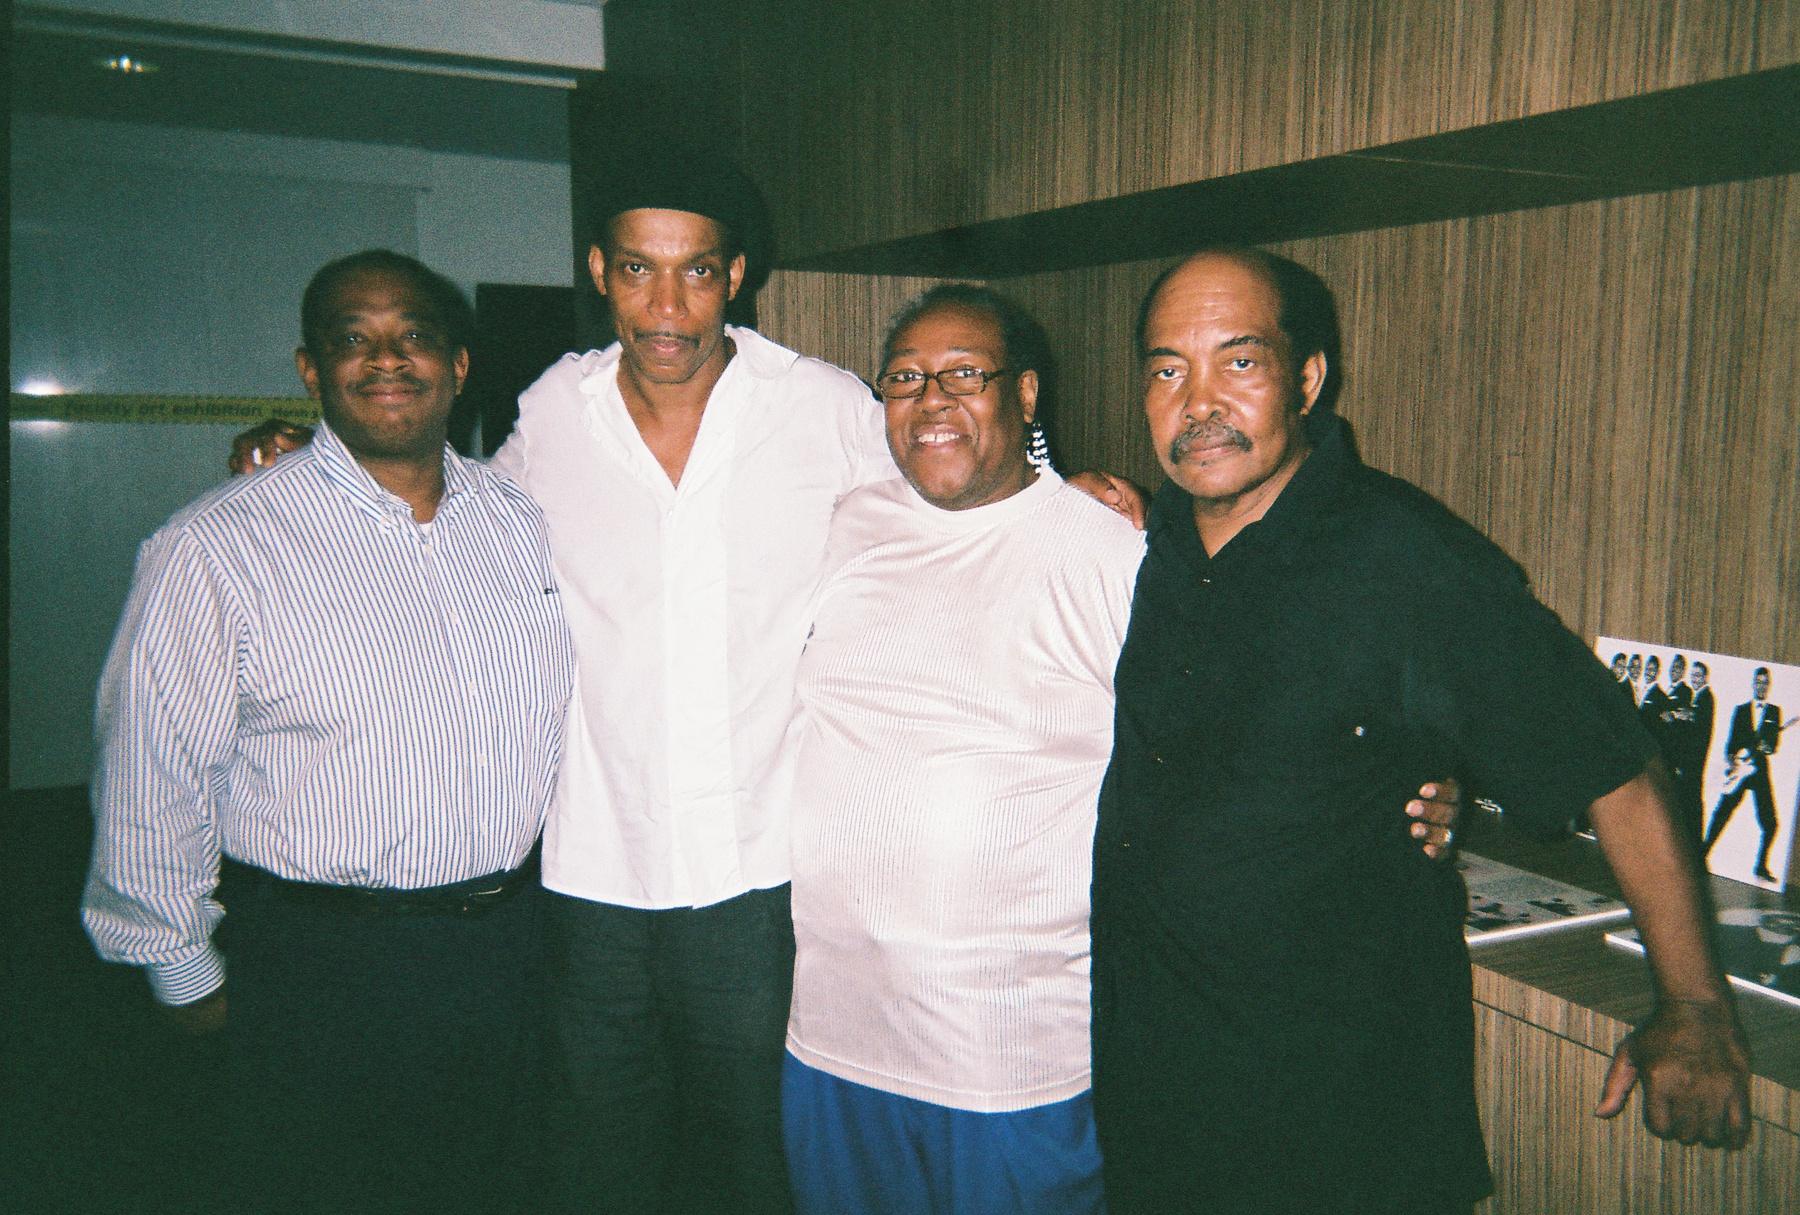 PJ WILLIS WITH CARL DAVIS JR., GREG PARKER & WILLIE HENDERSON